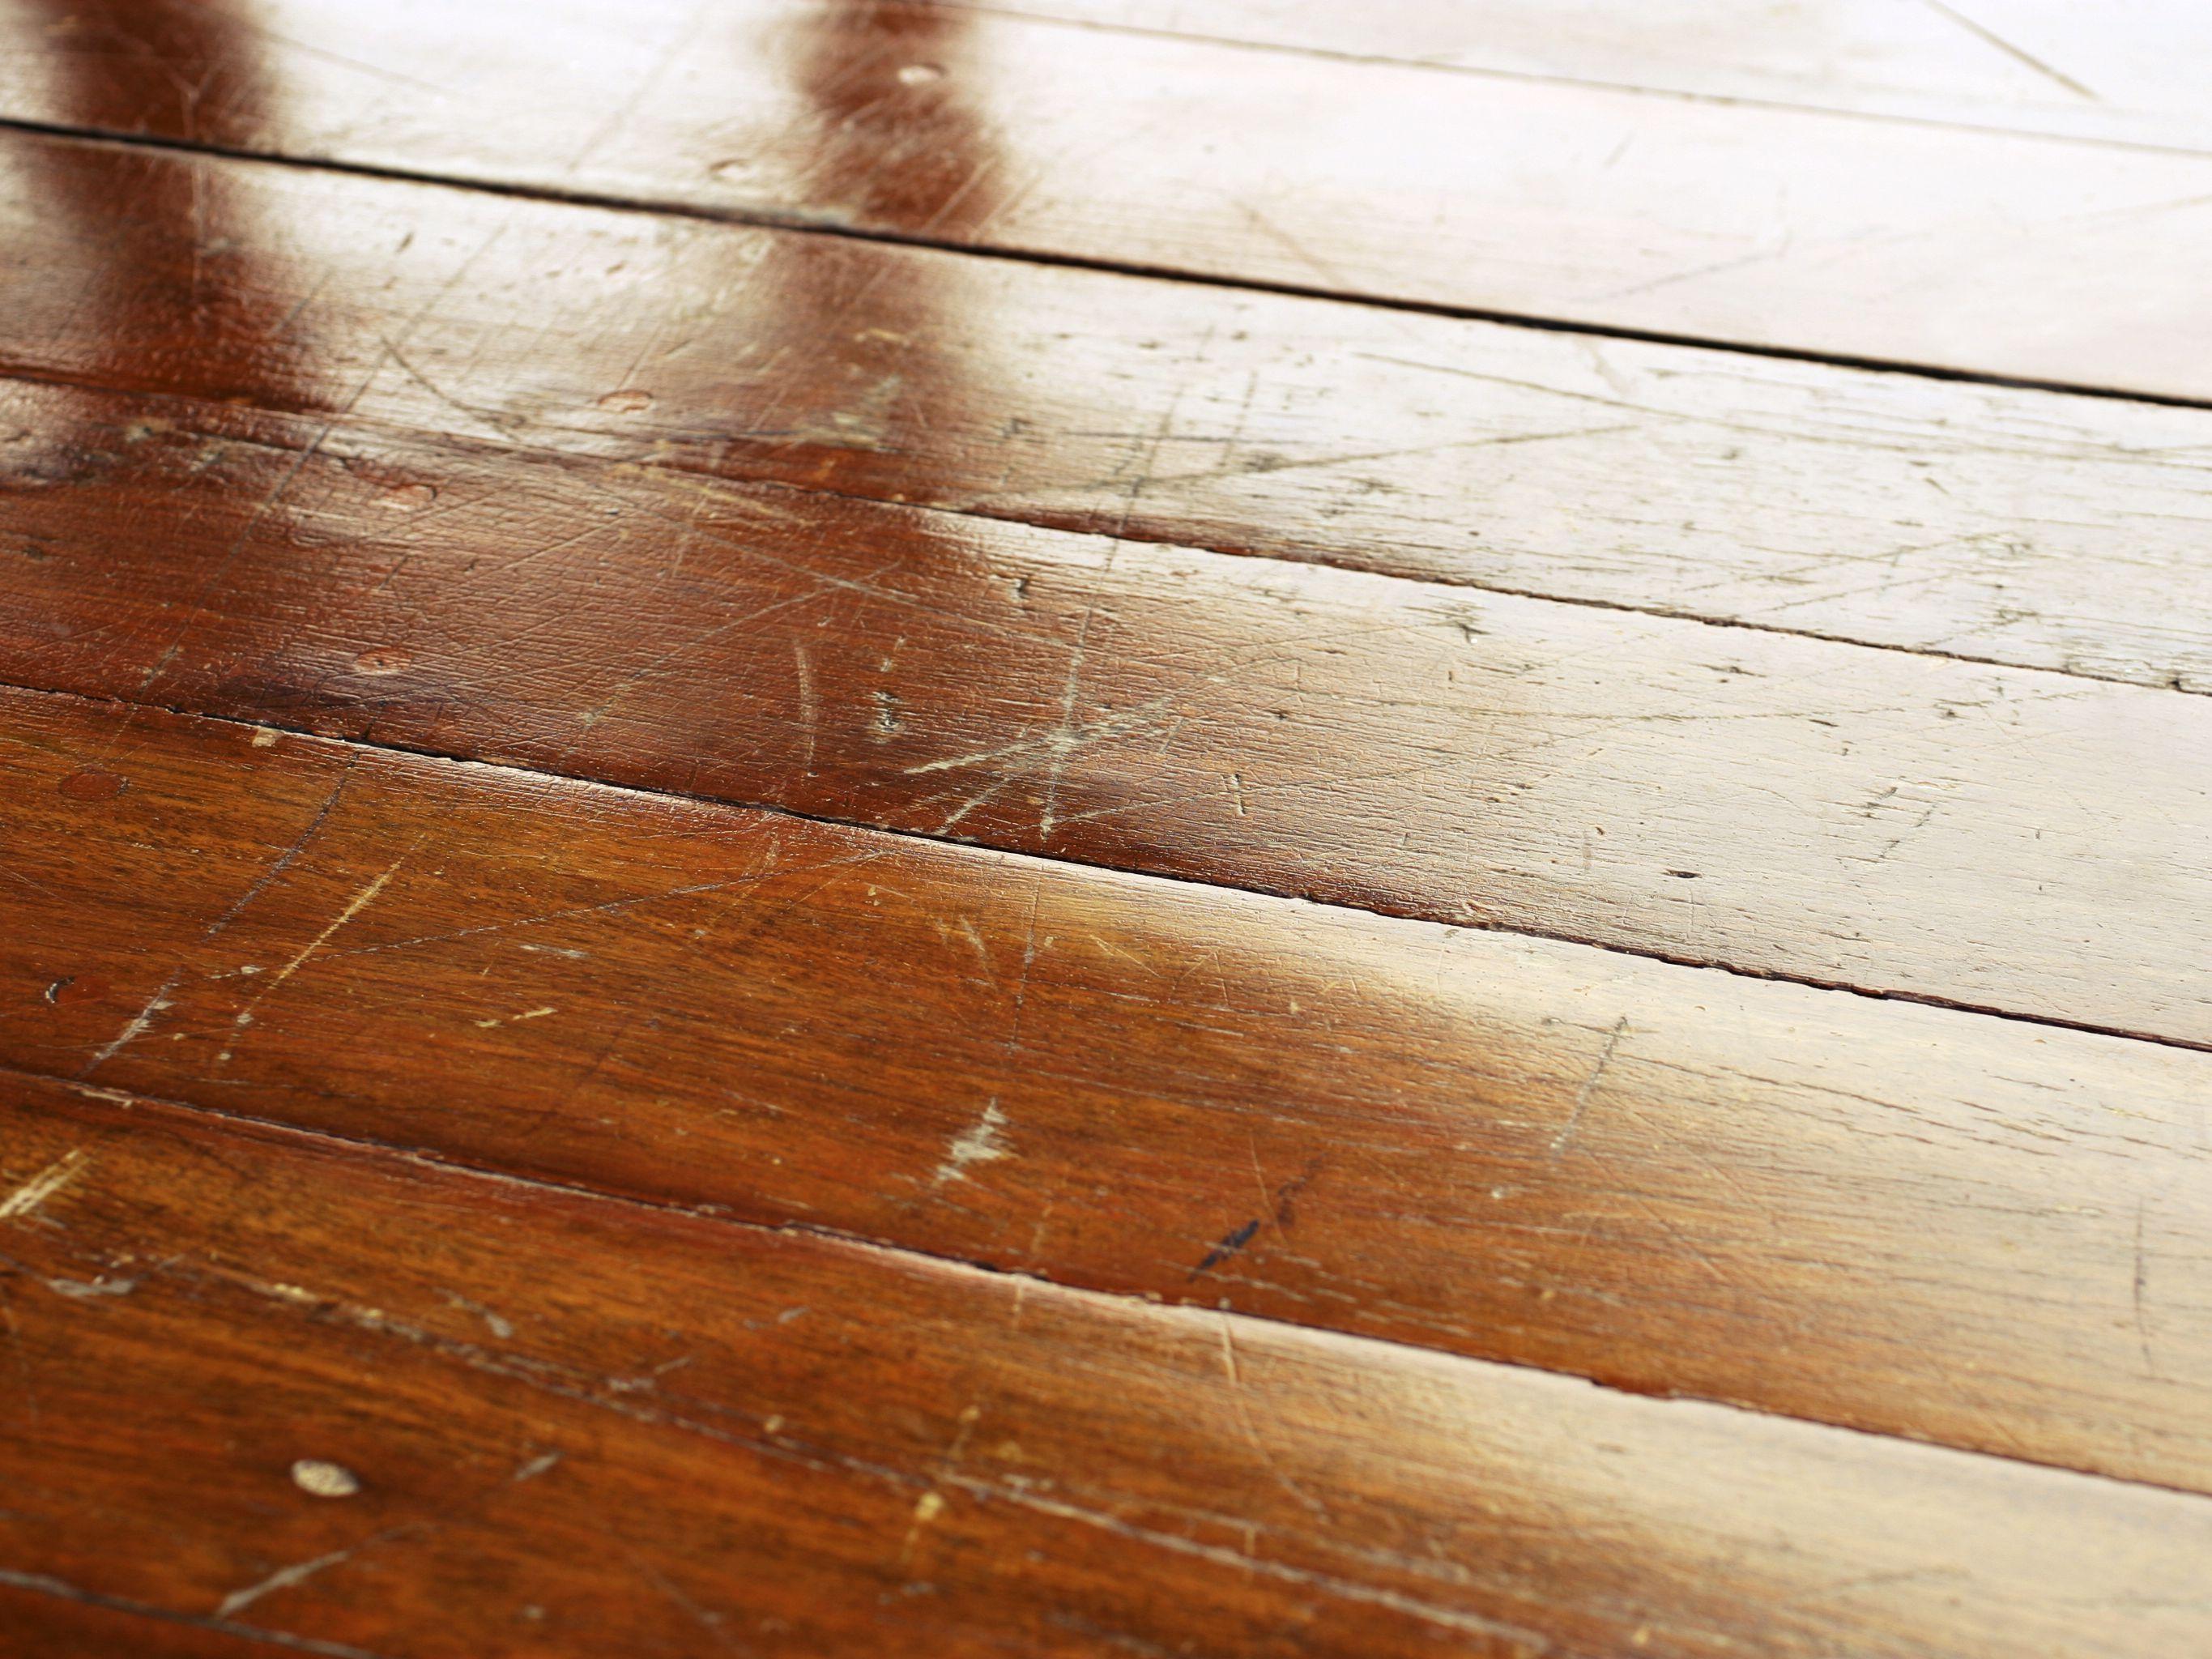 How to Repair Scratched Hardwood Floors